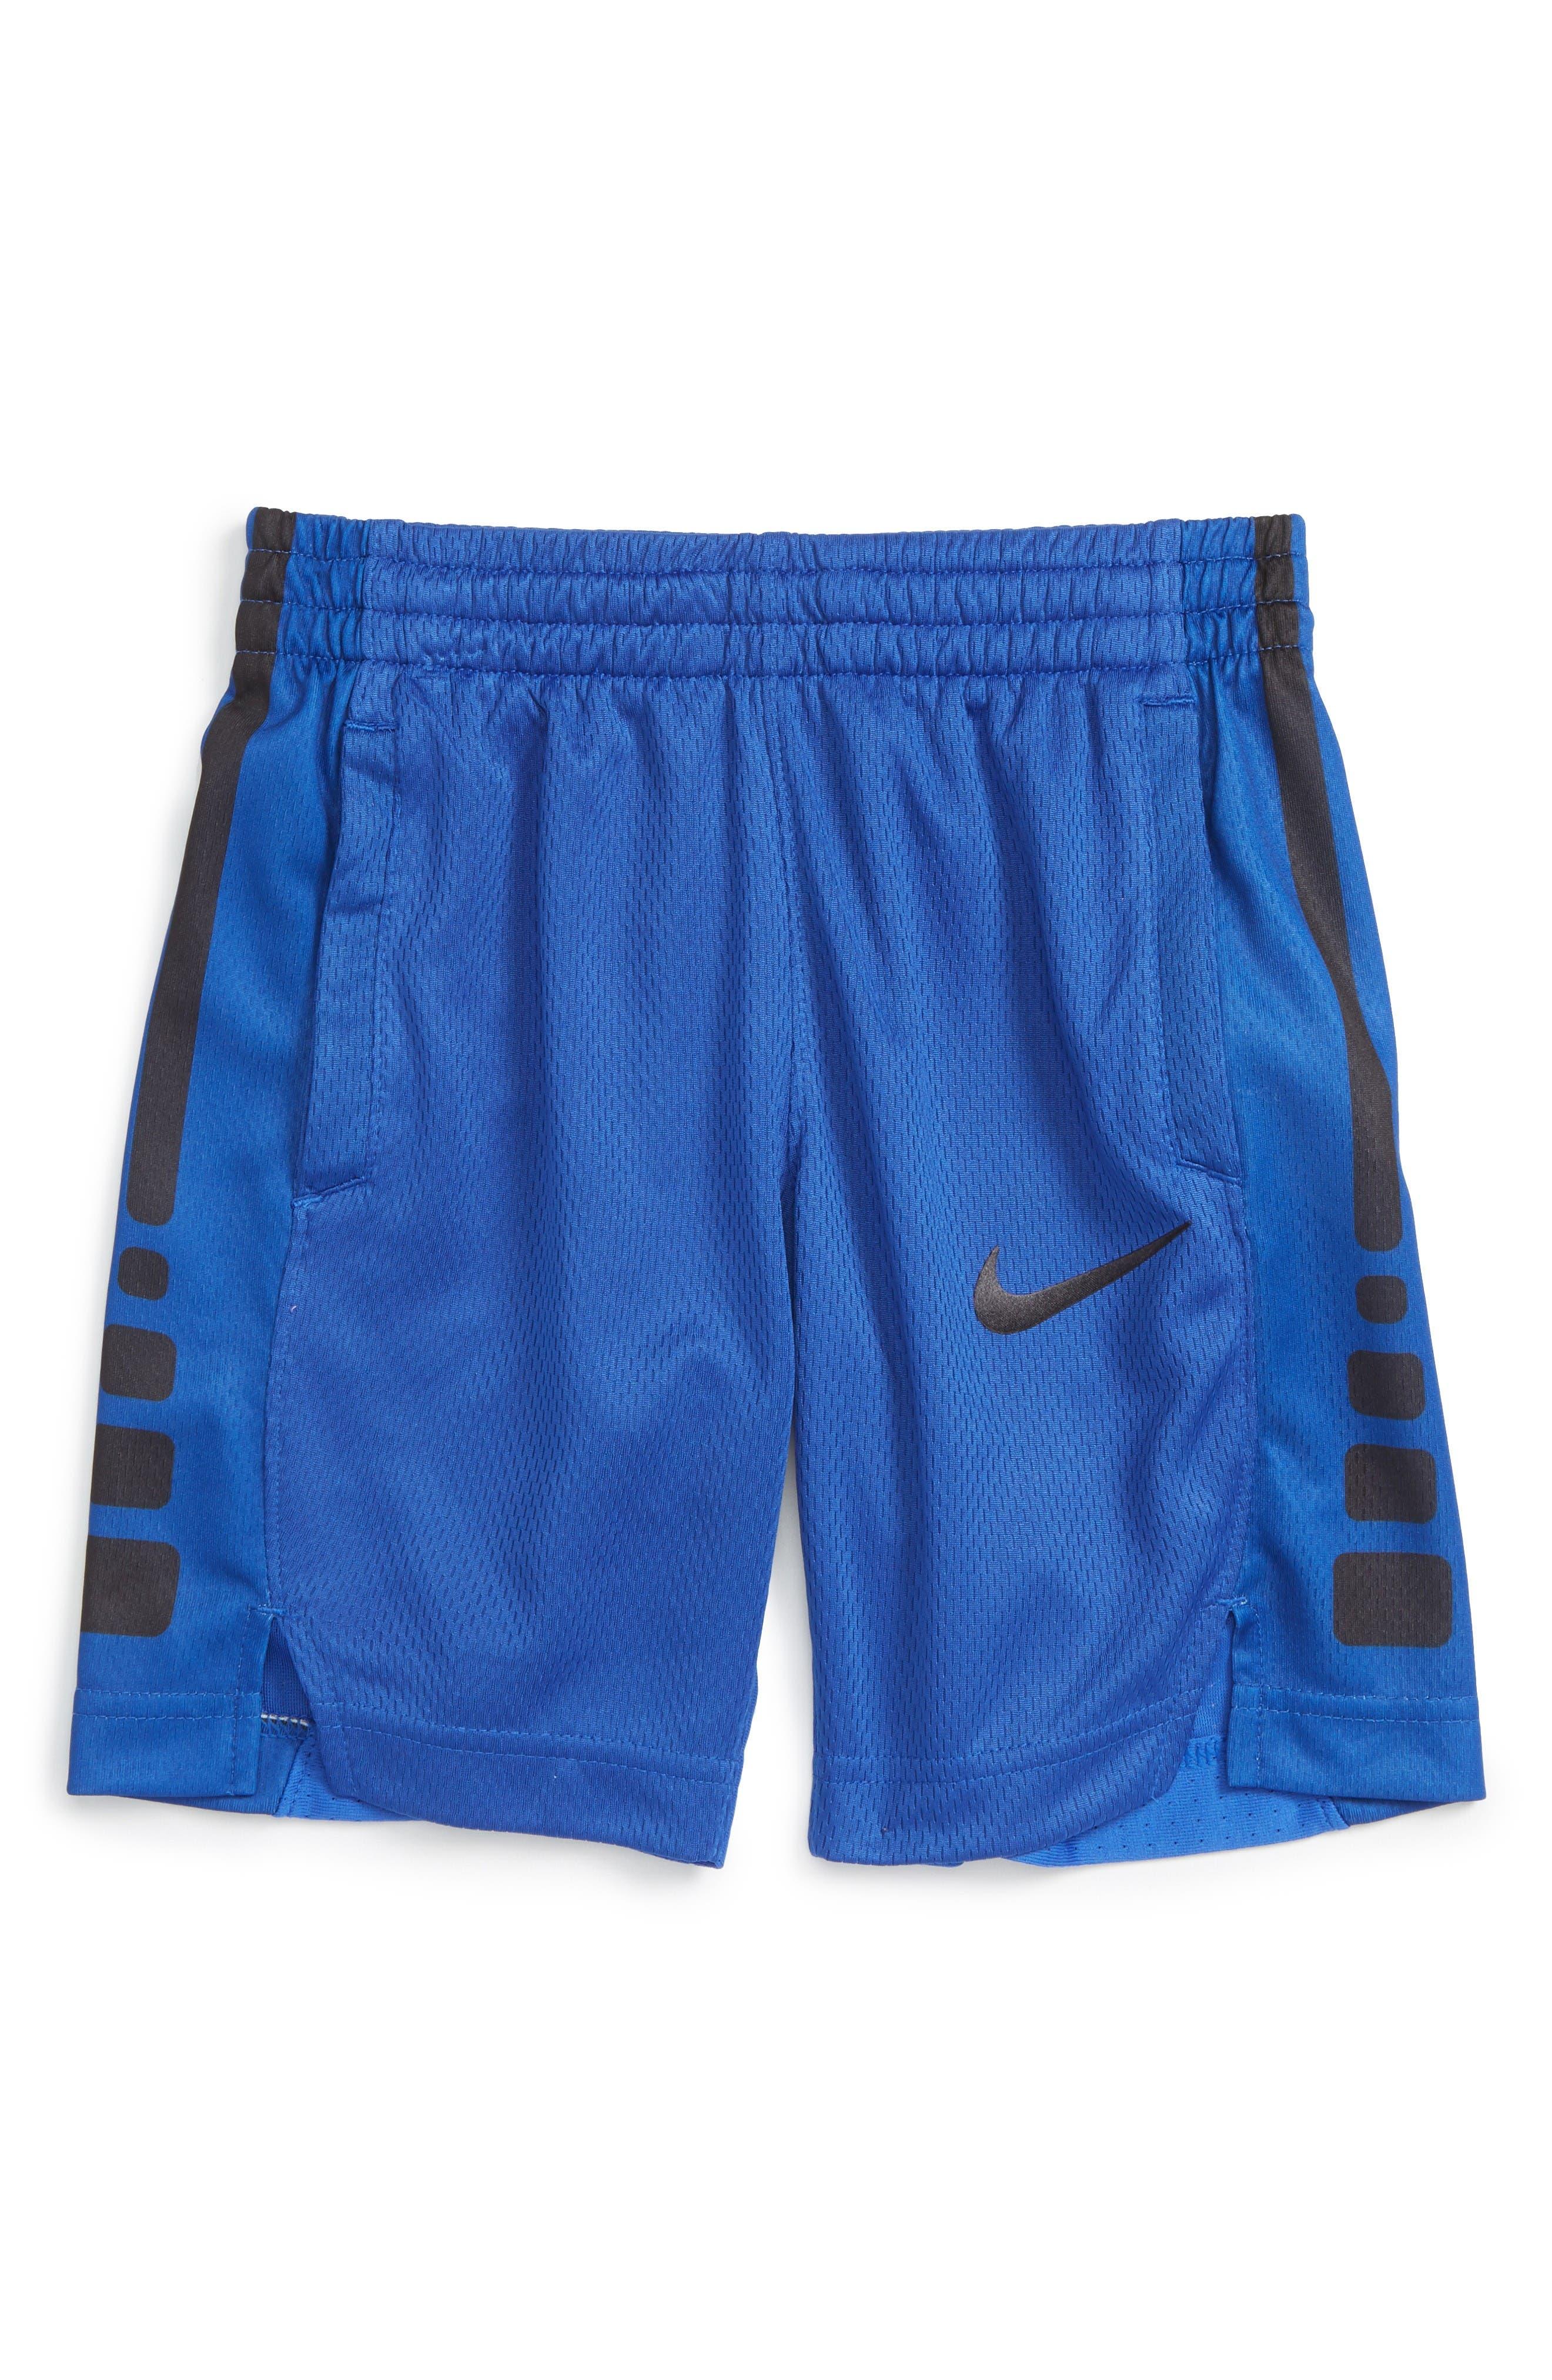 Elite Stripe Shorts,                             Main thumbnail 1, color,                             Game Royal